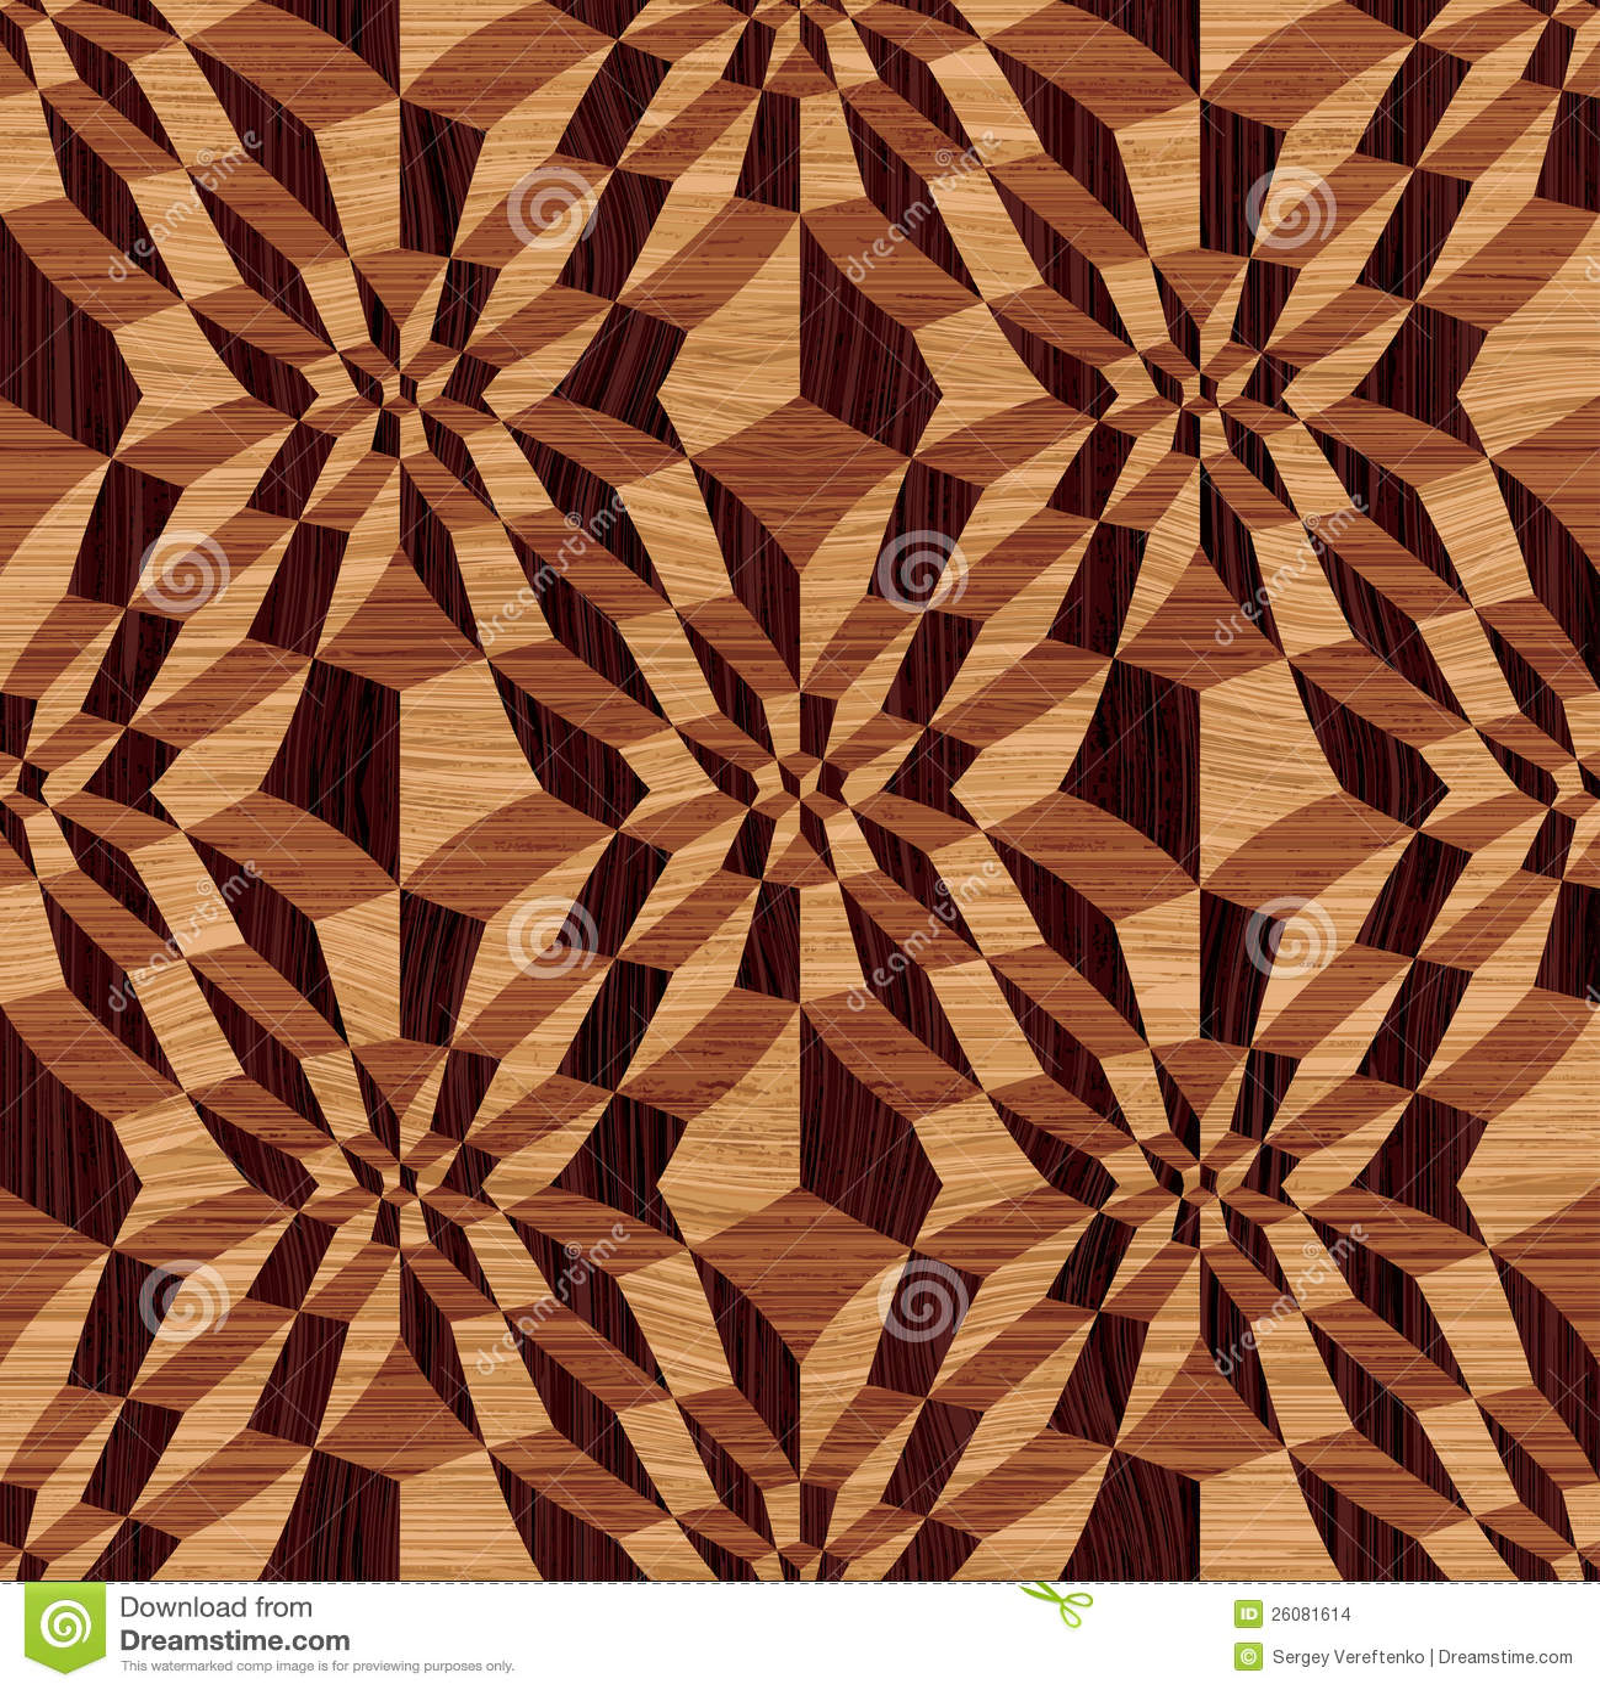 Wooden Geometric Pattern Stock Vector Illustration Of